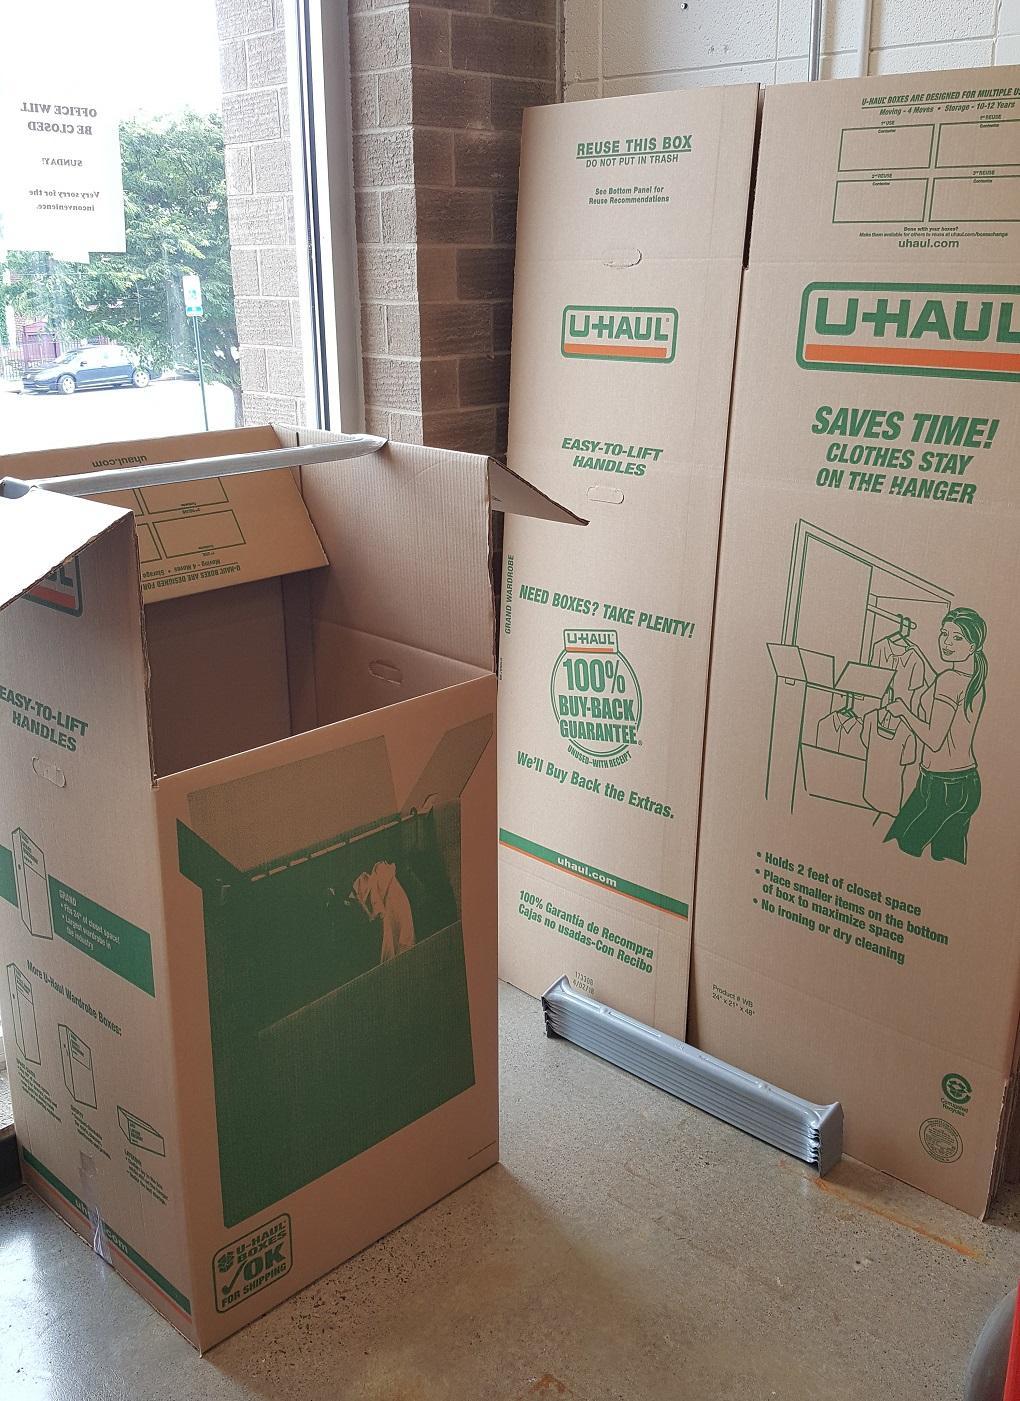 Wardrobe boxes.